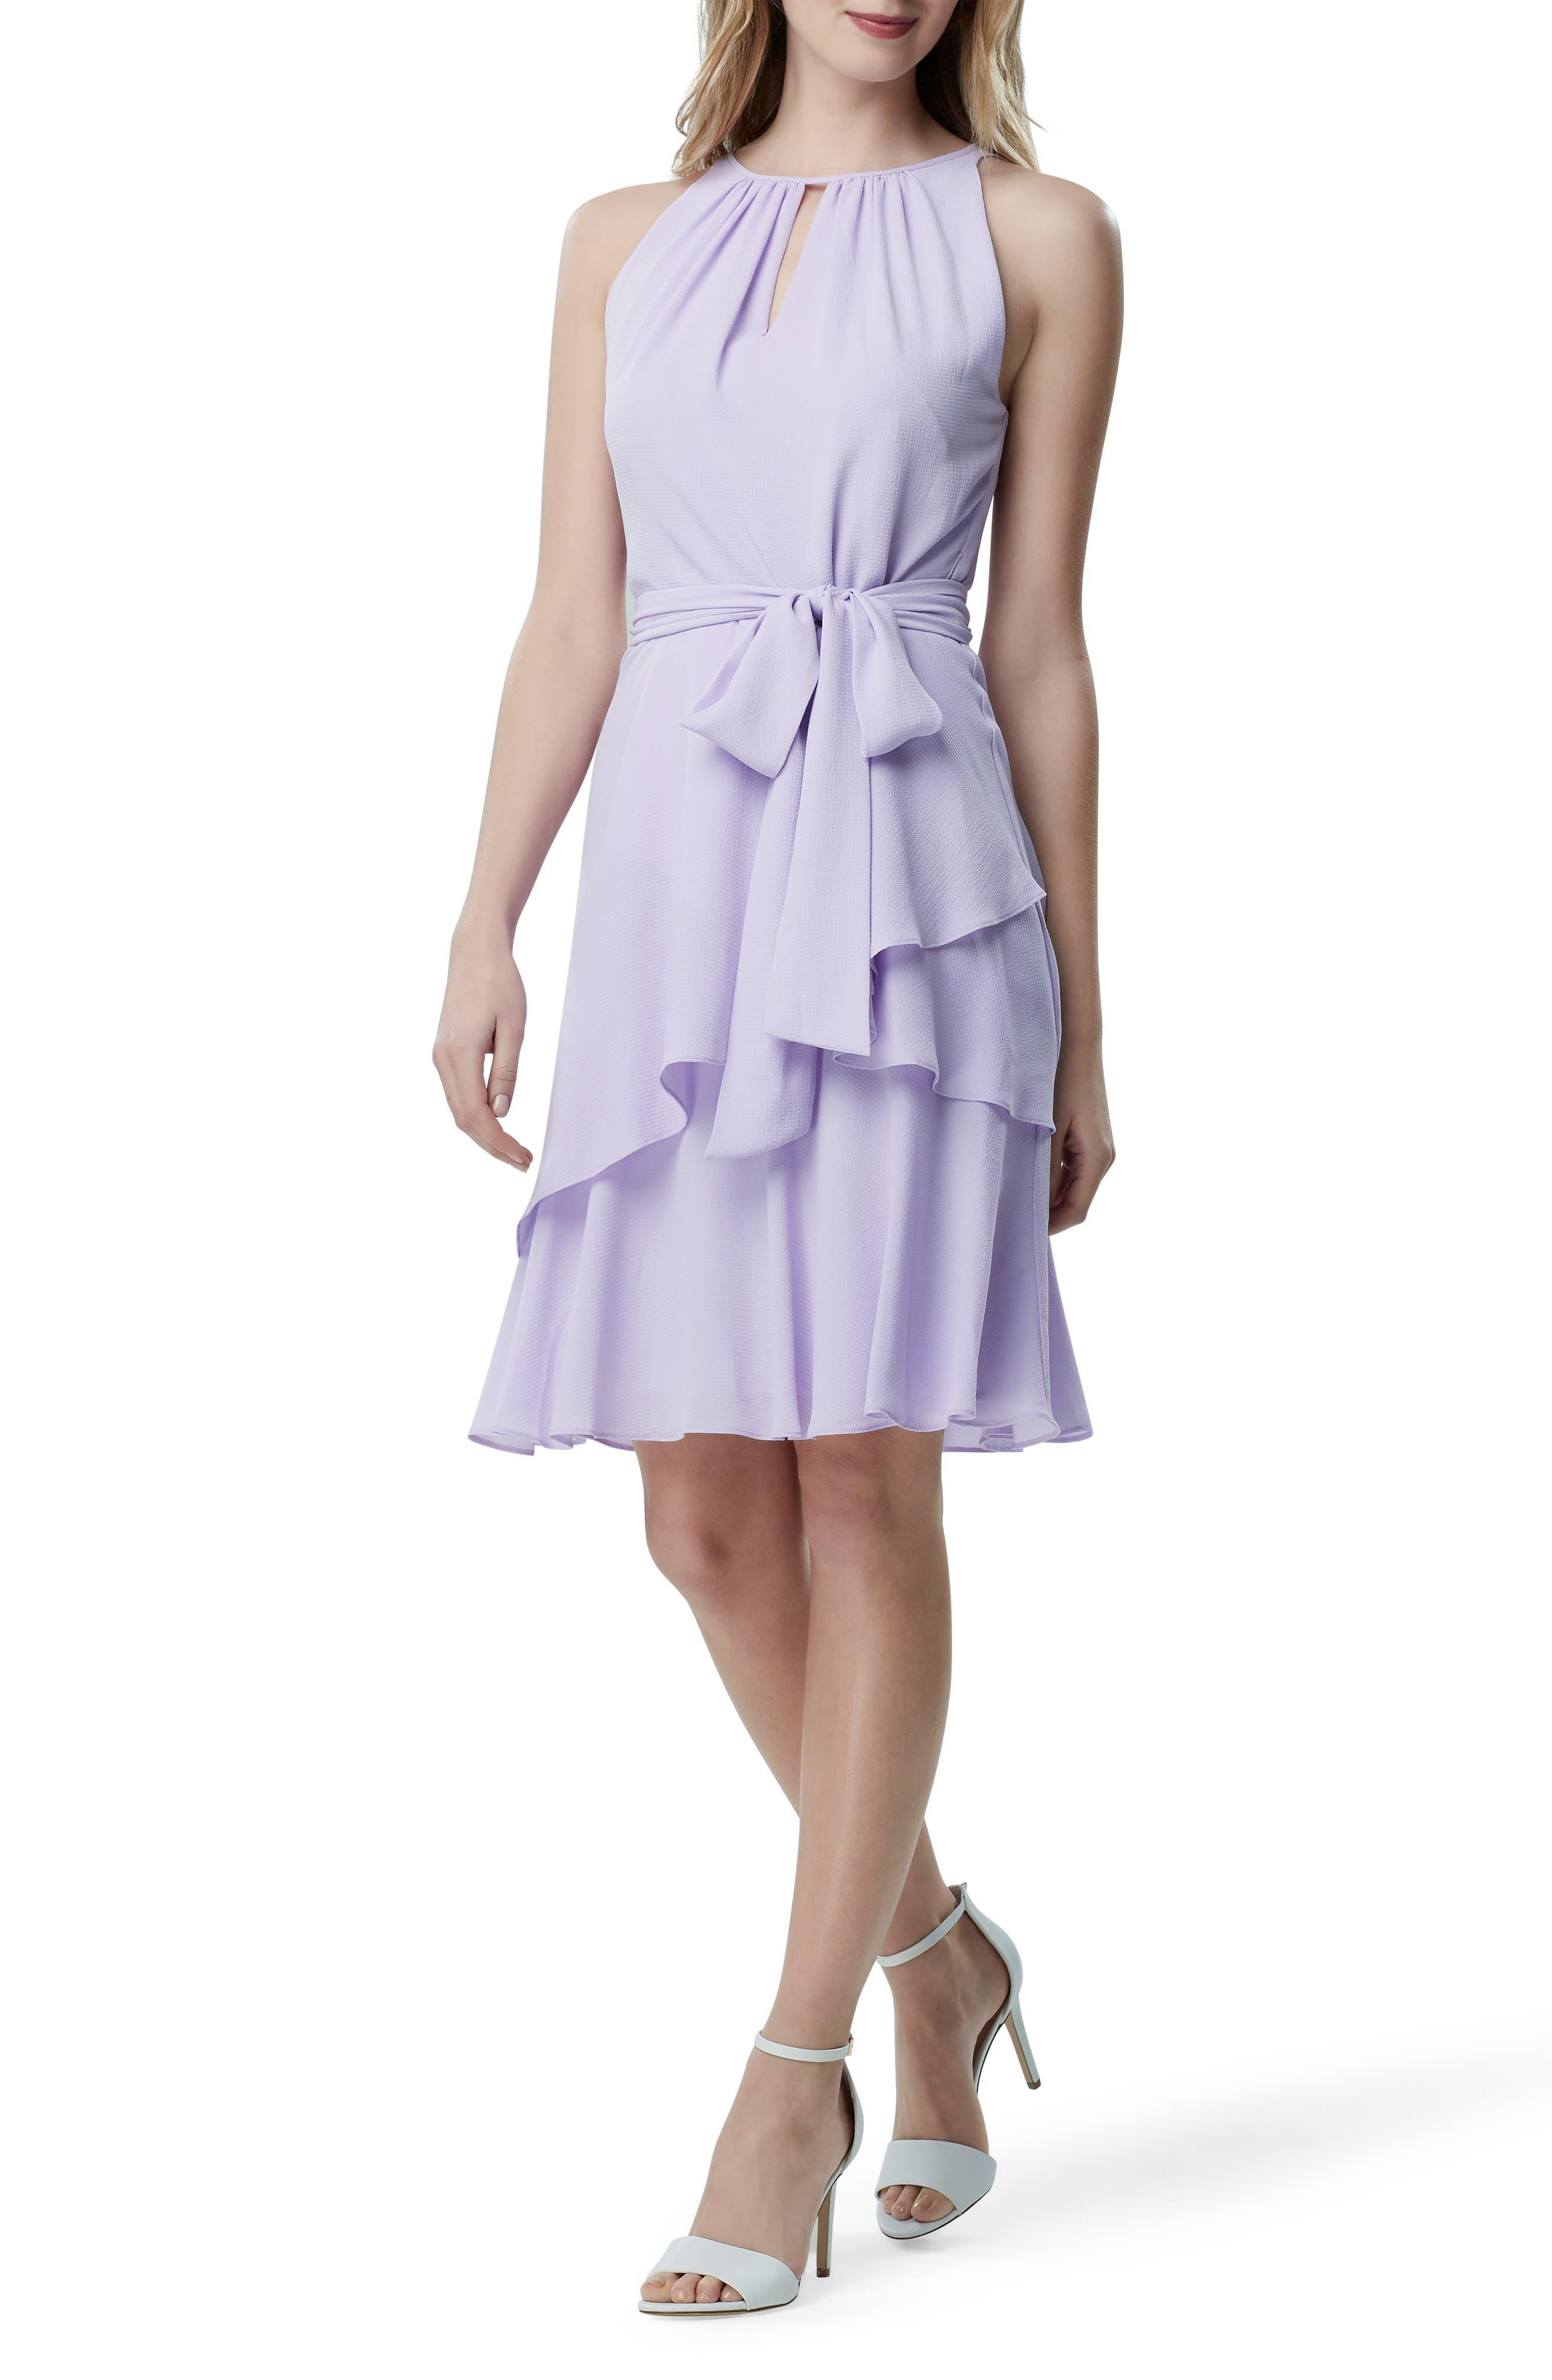 Tahari Hilton Tiered Ruffle Sleeveless Crepe Dress, Purple